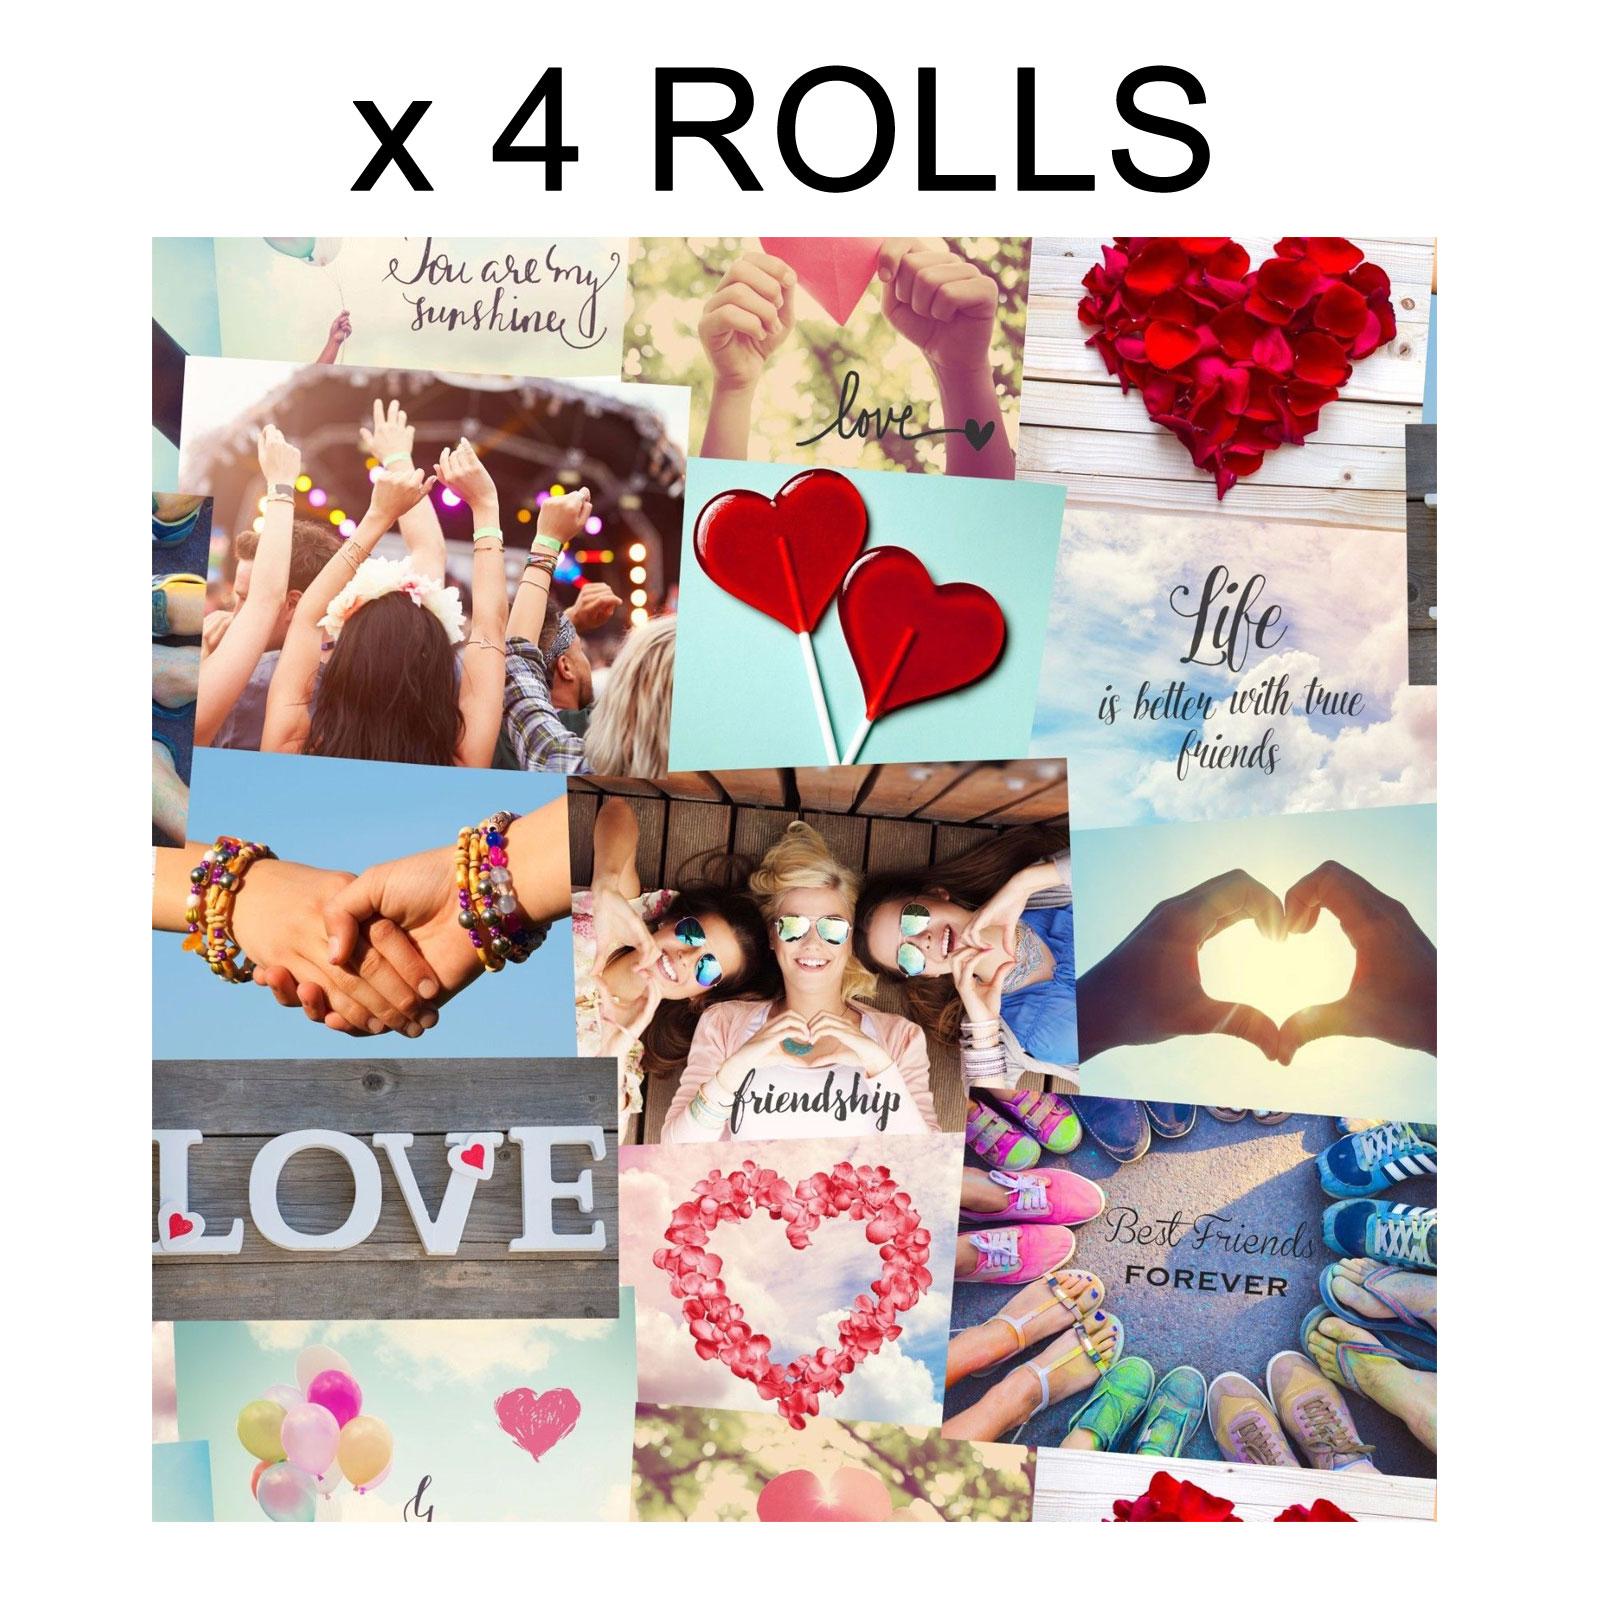 Love Festival Friends Wallpaper Hearts Collage Girls Teenager Luxury Heavyweight